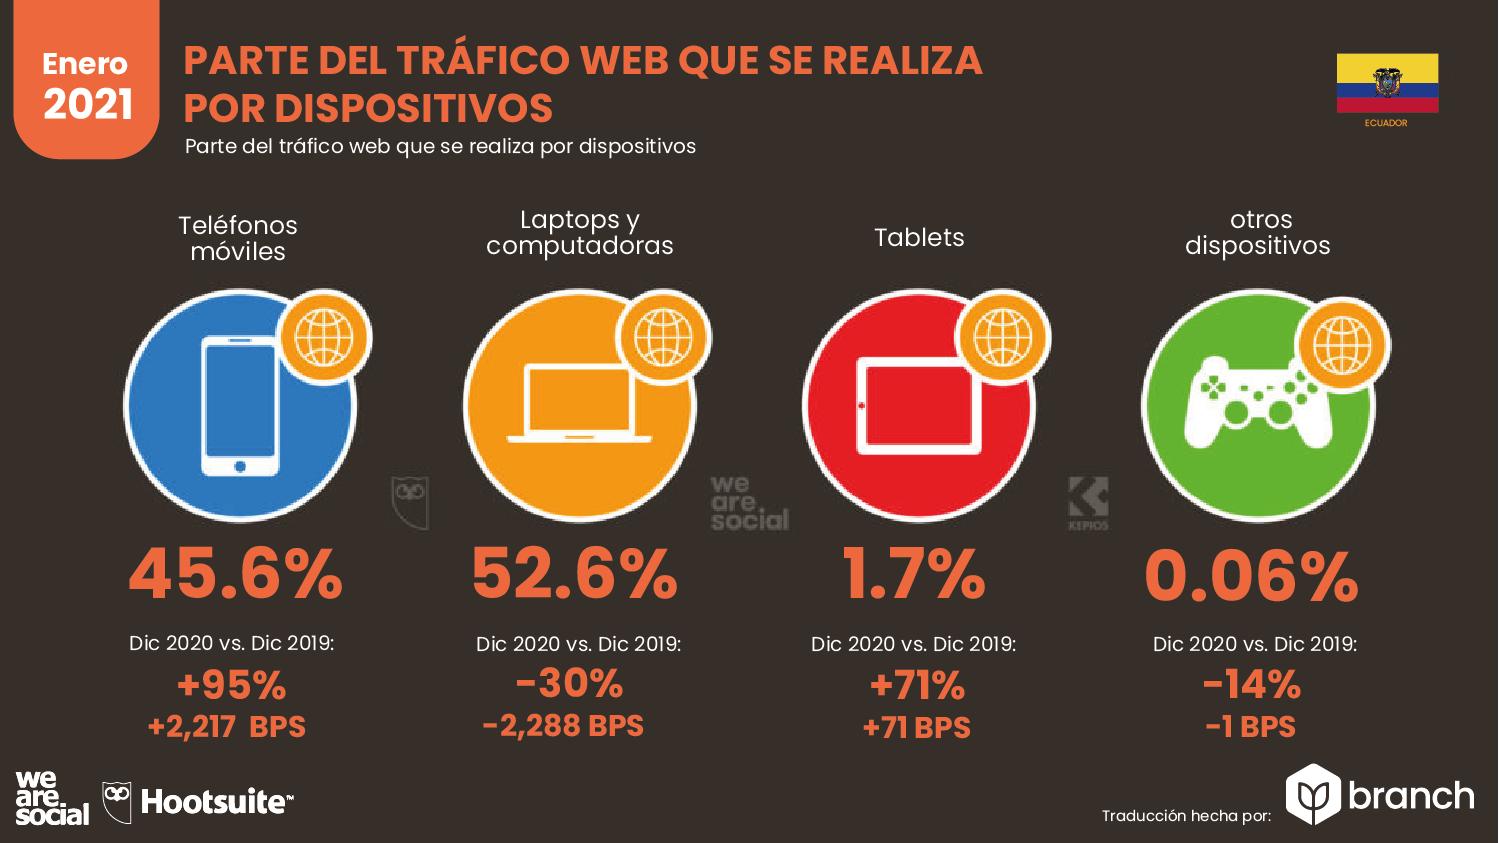 trafico-web-por-dispositivos-ecuador-2020-2021